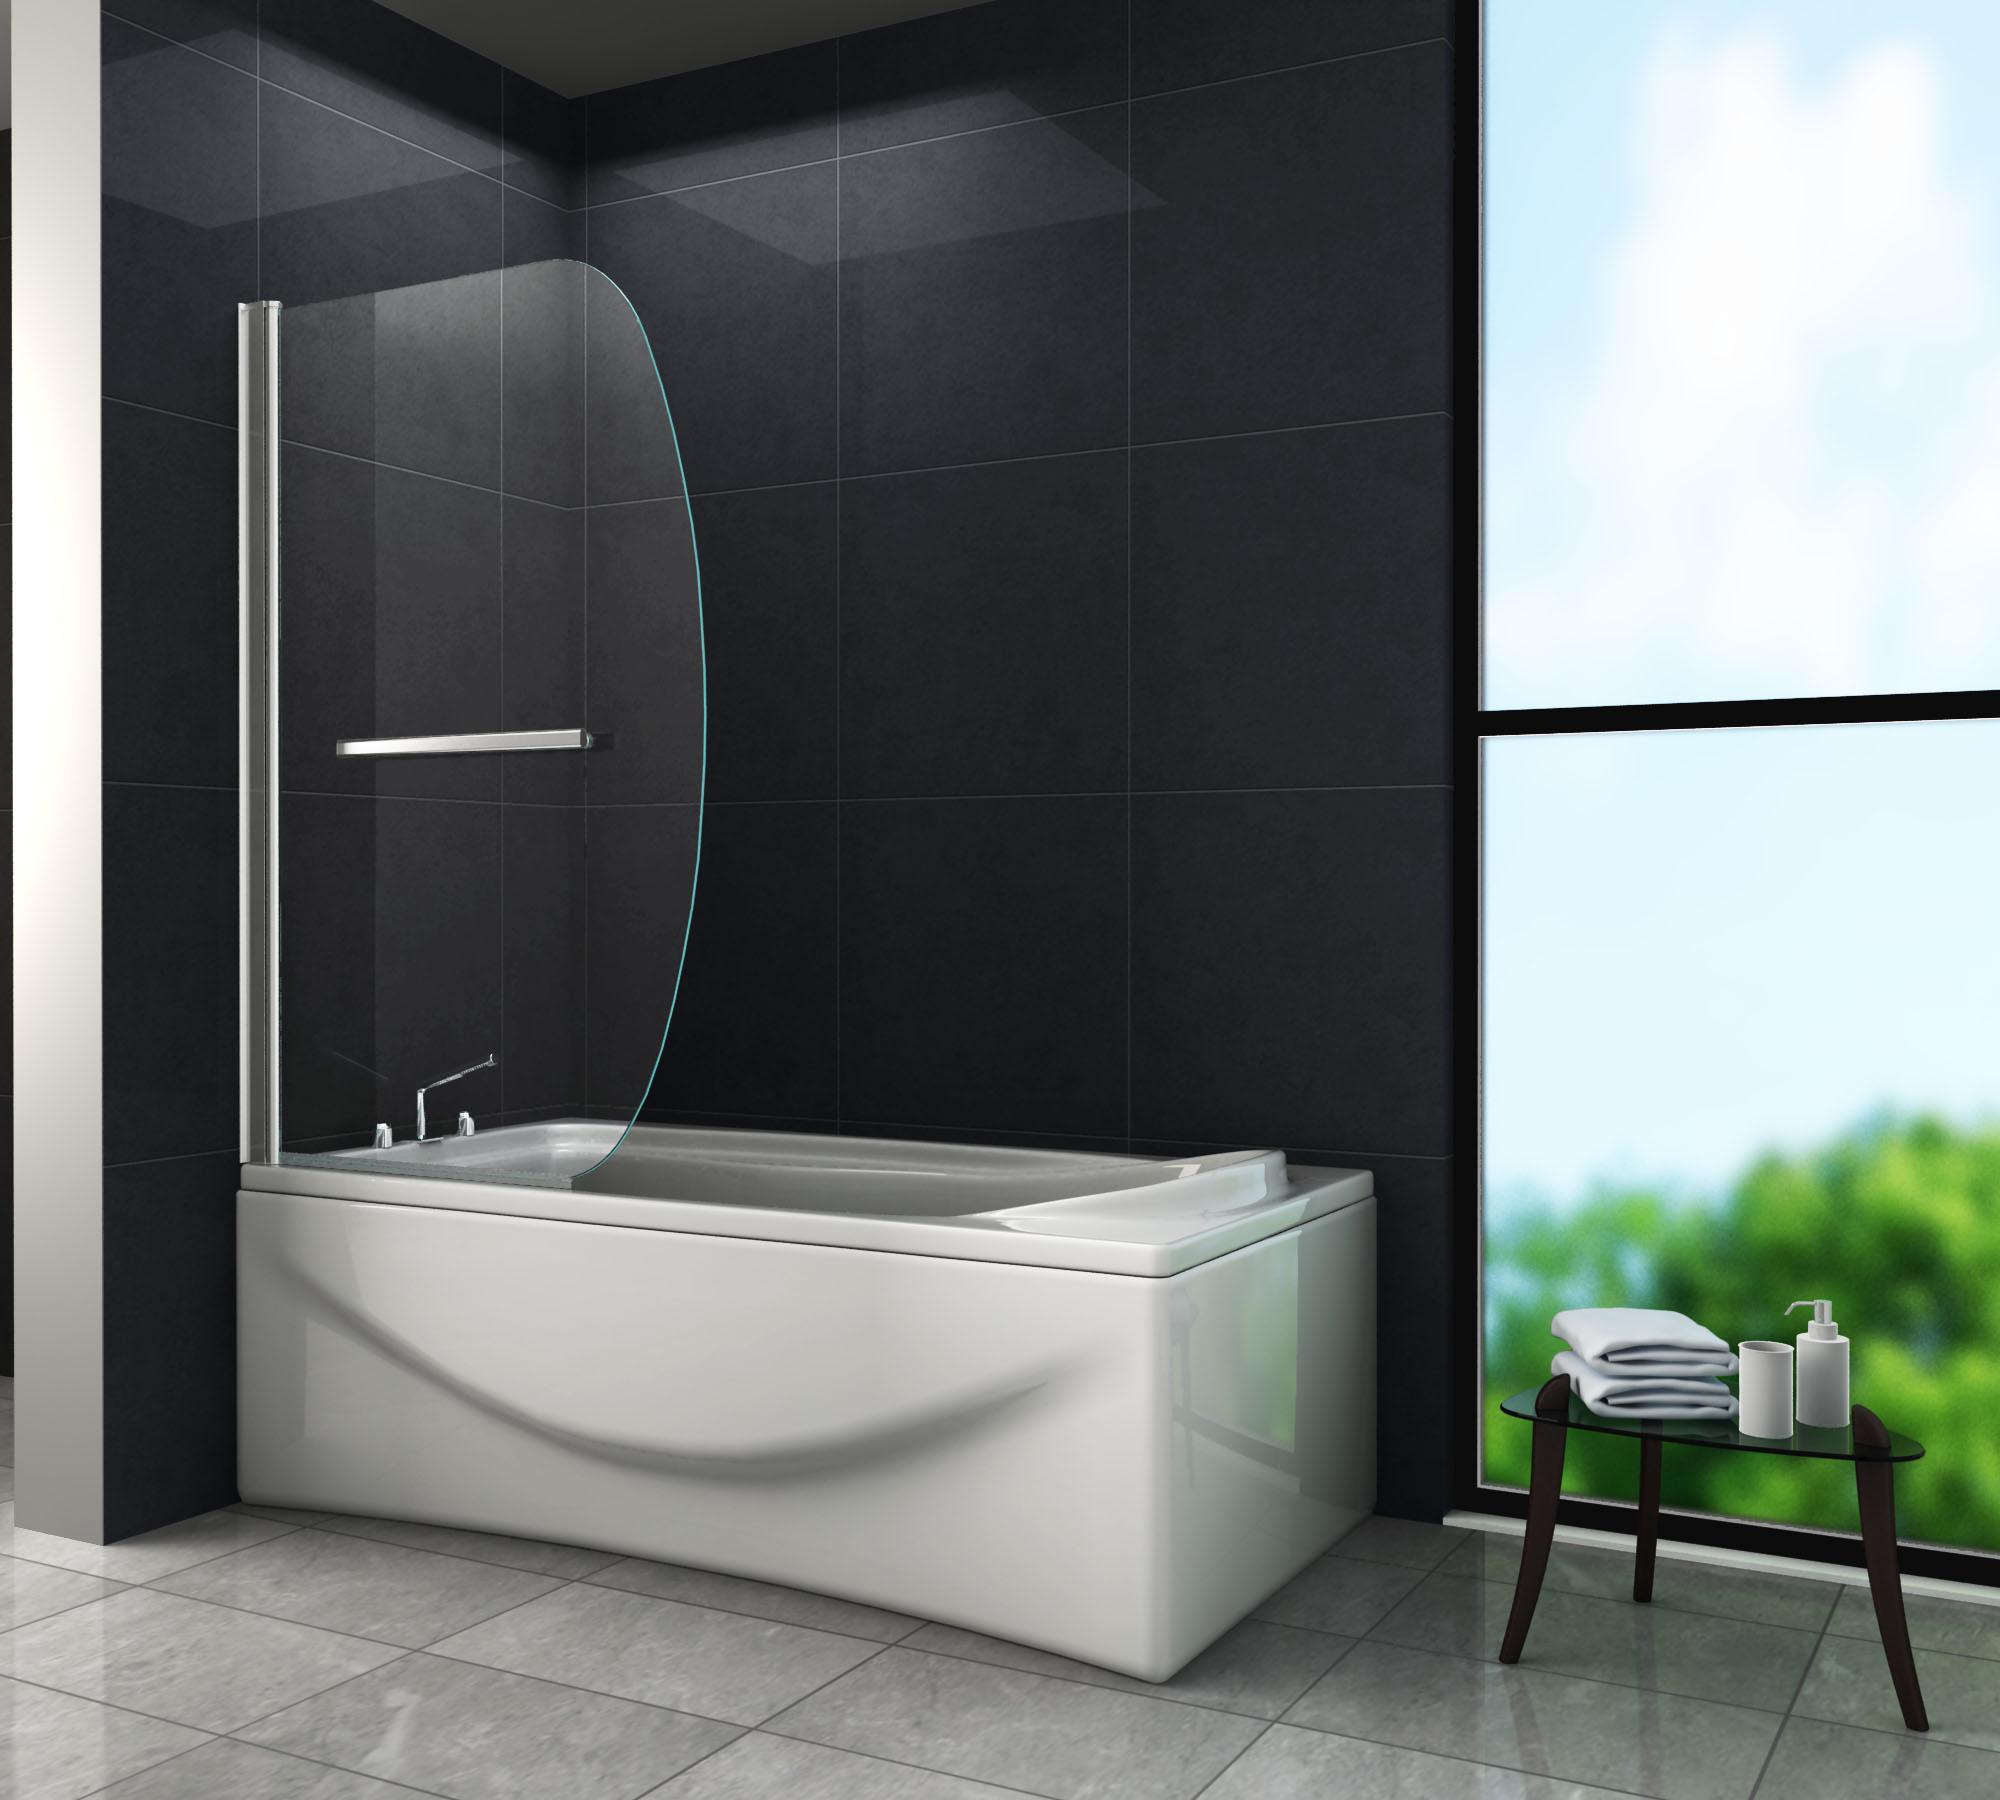 duschtrennwand moon 90 x 140 badewanne glasdeals. Black Bedroom Furniture Sets. Home Design Ideas